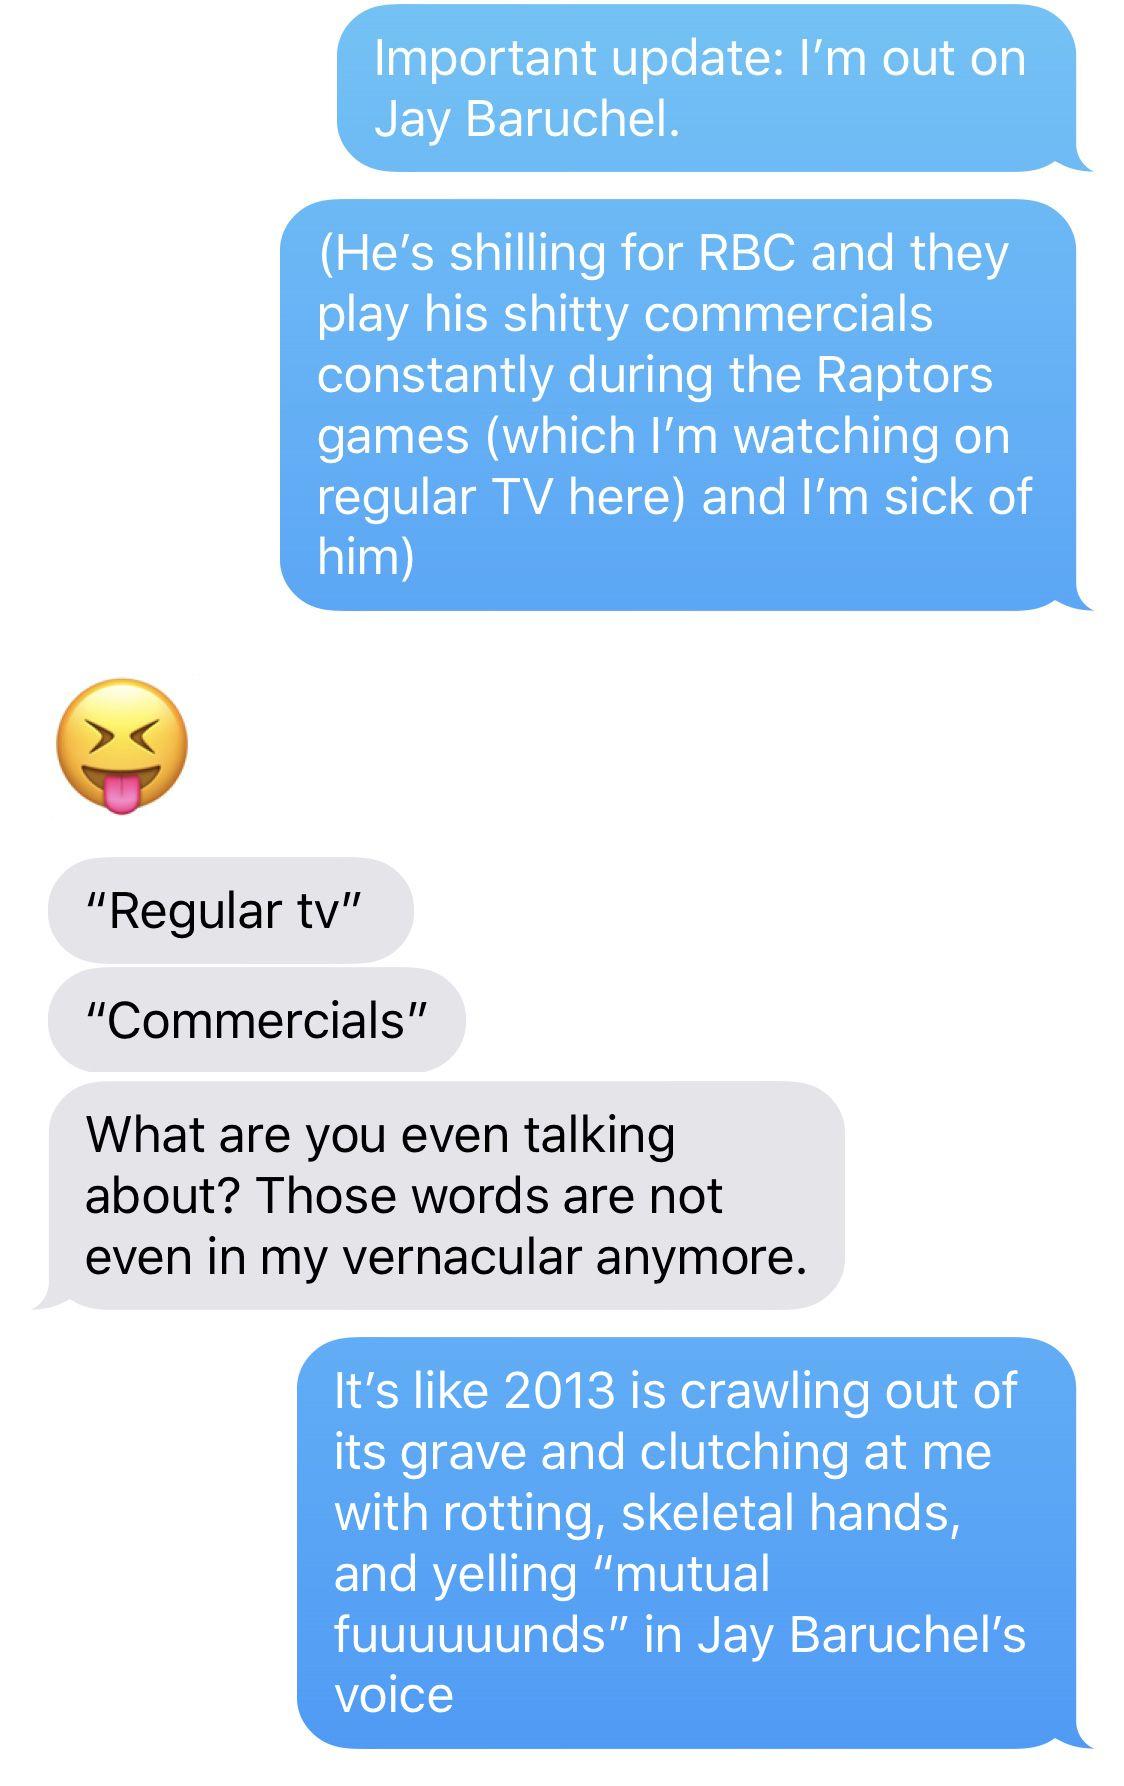 Cleveland Cavaliers, Toronto Raptors, Jay Baruchel